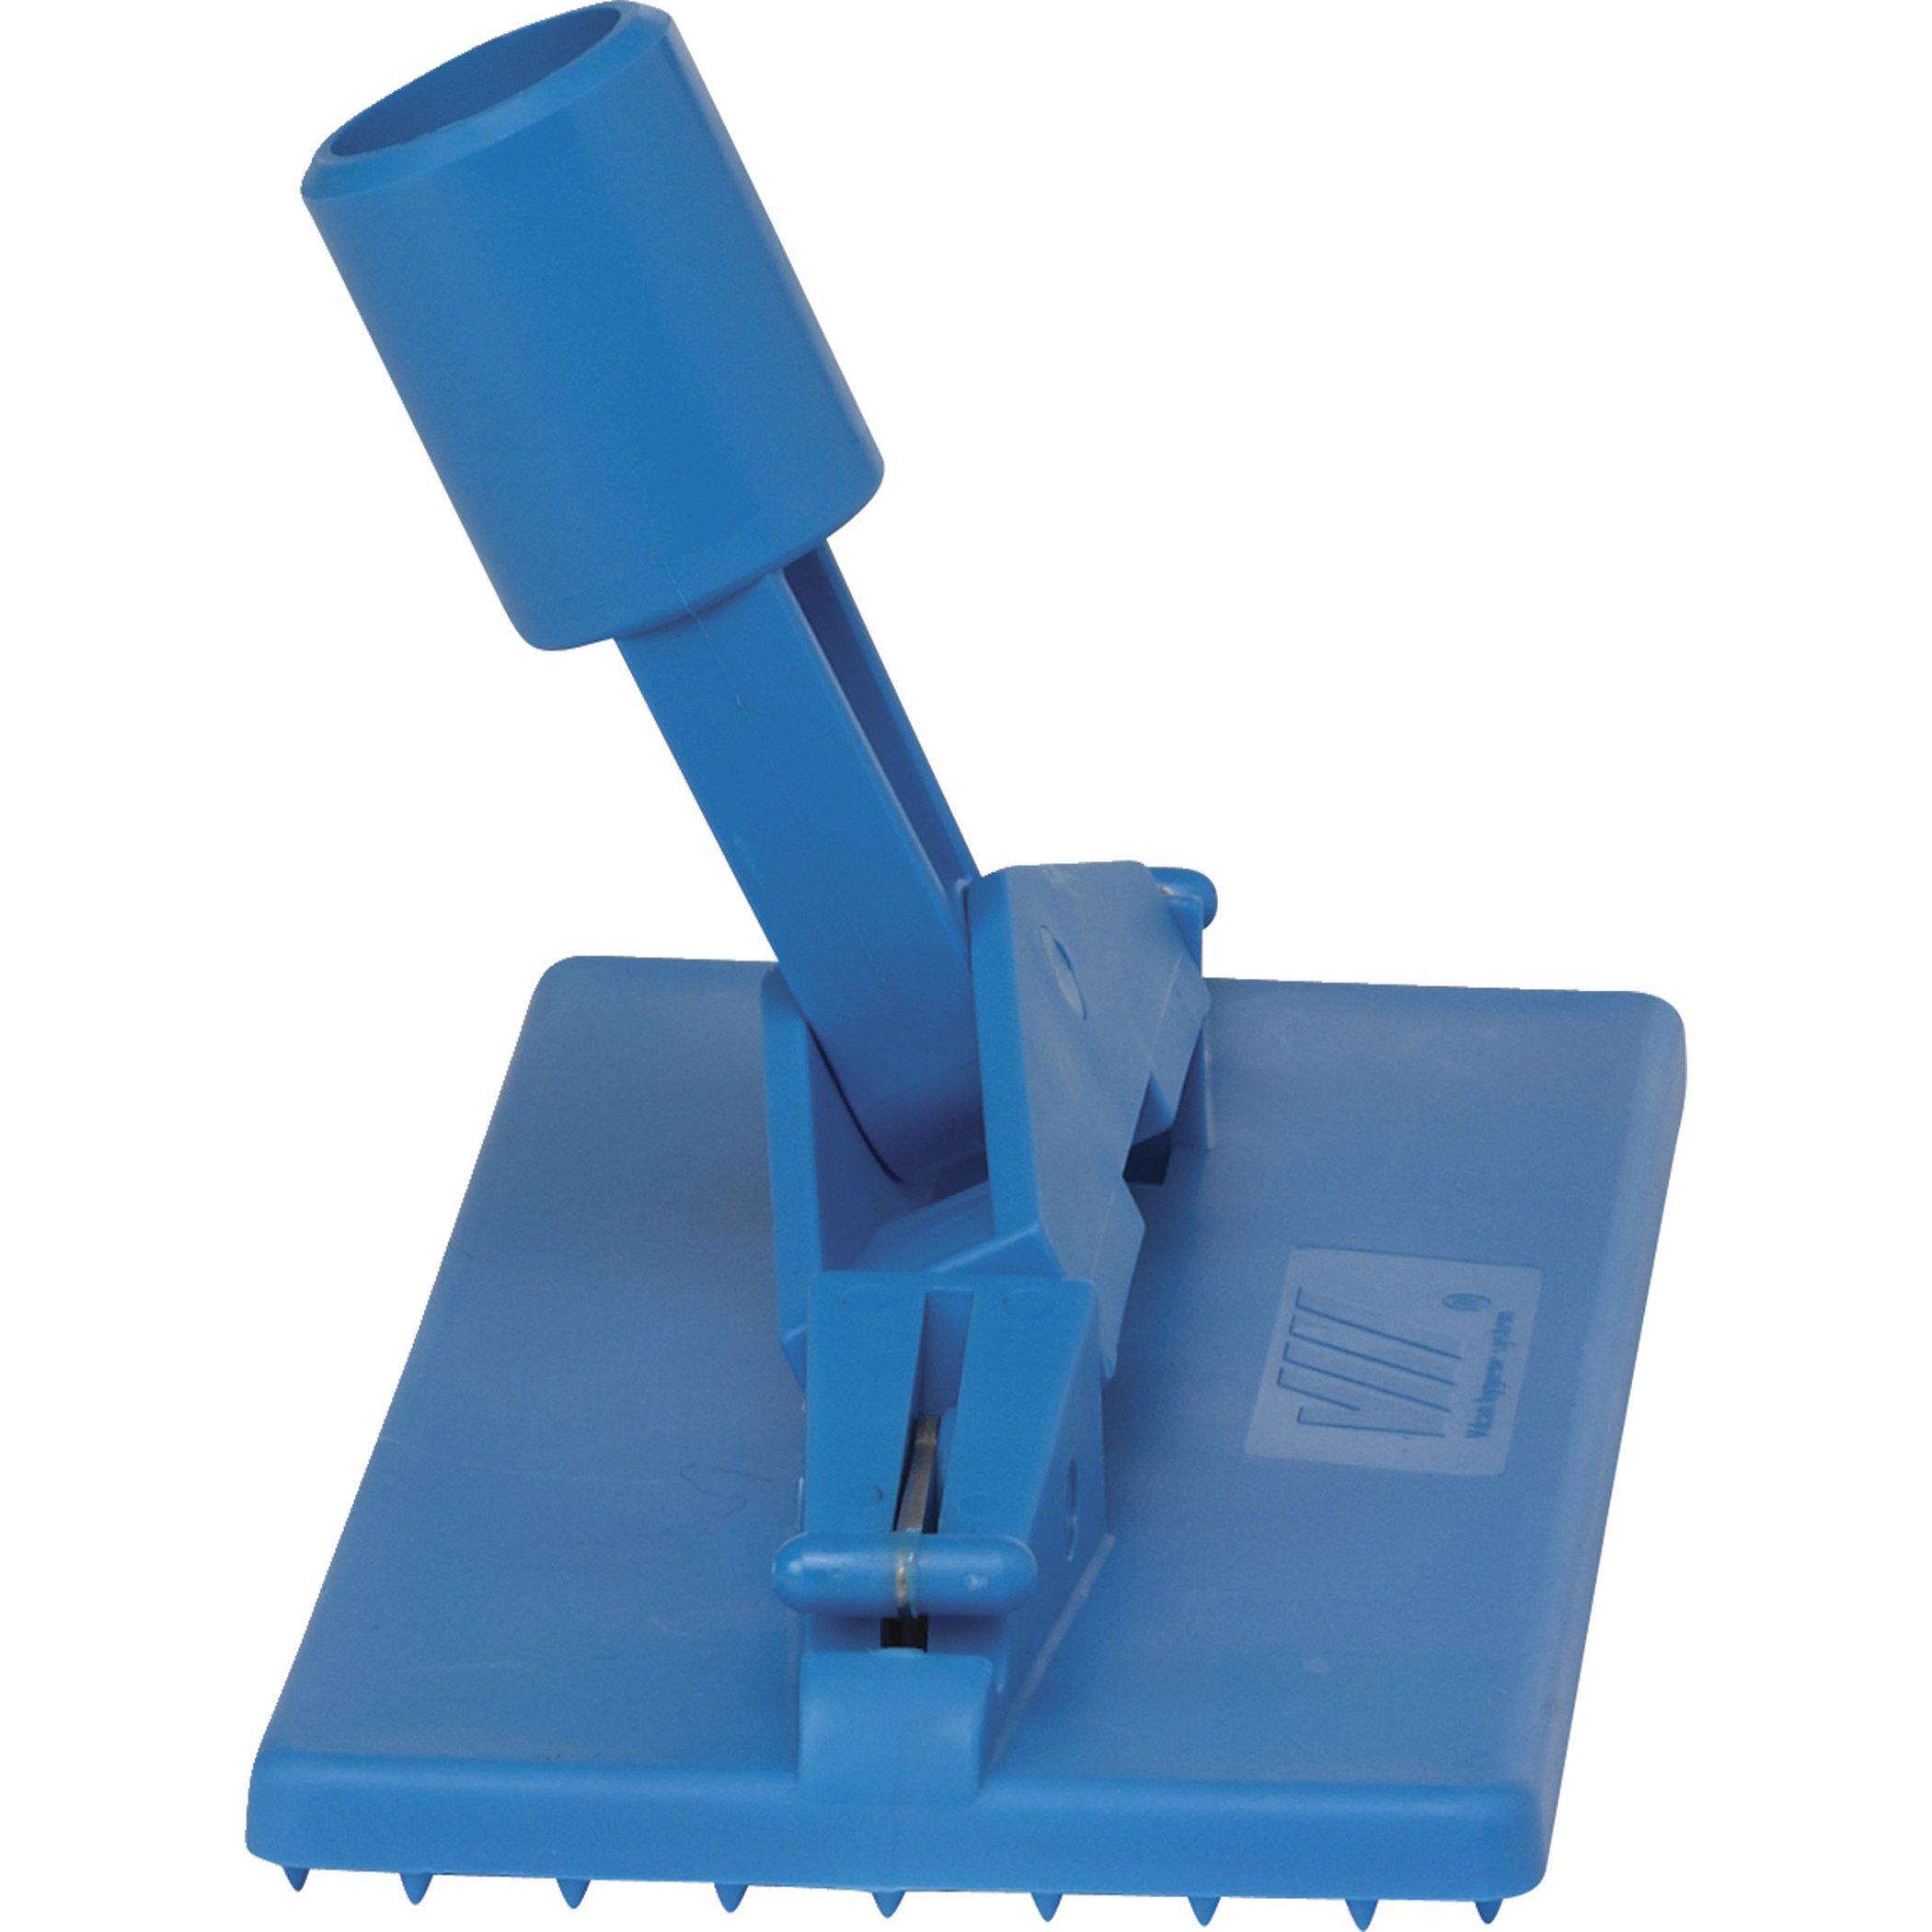 Scrub Pad Holder, Blue, 9''L by Vikan